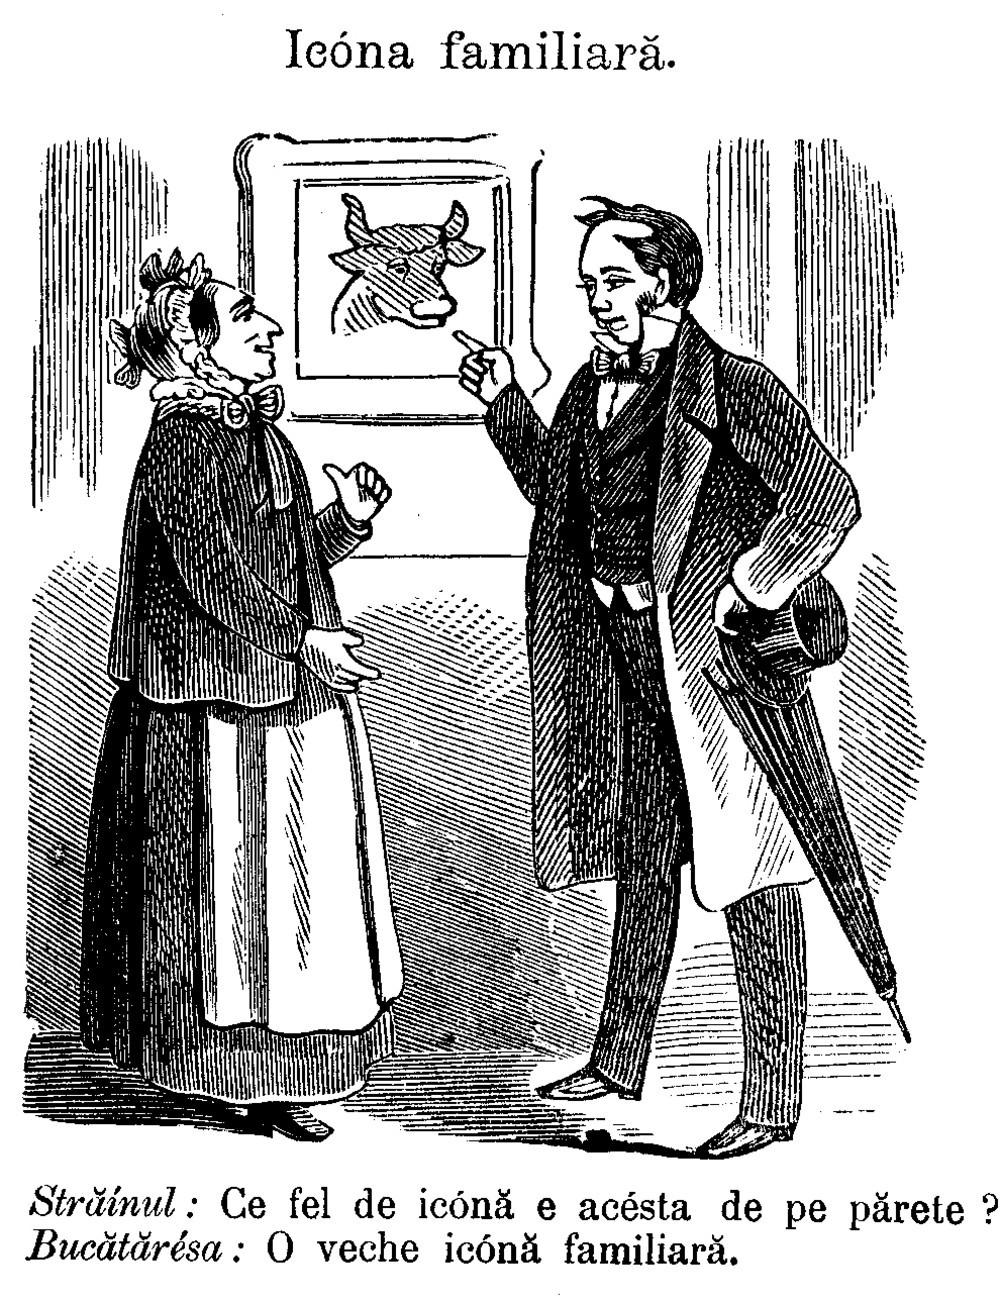 1882 Icoana familiara